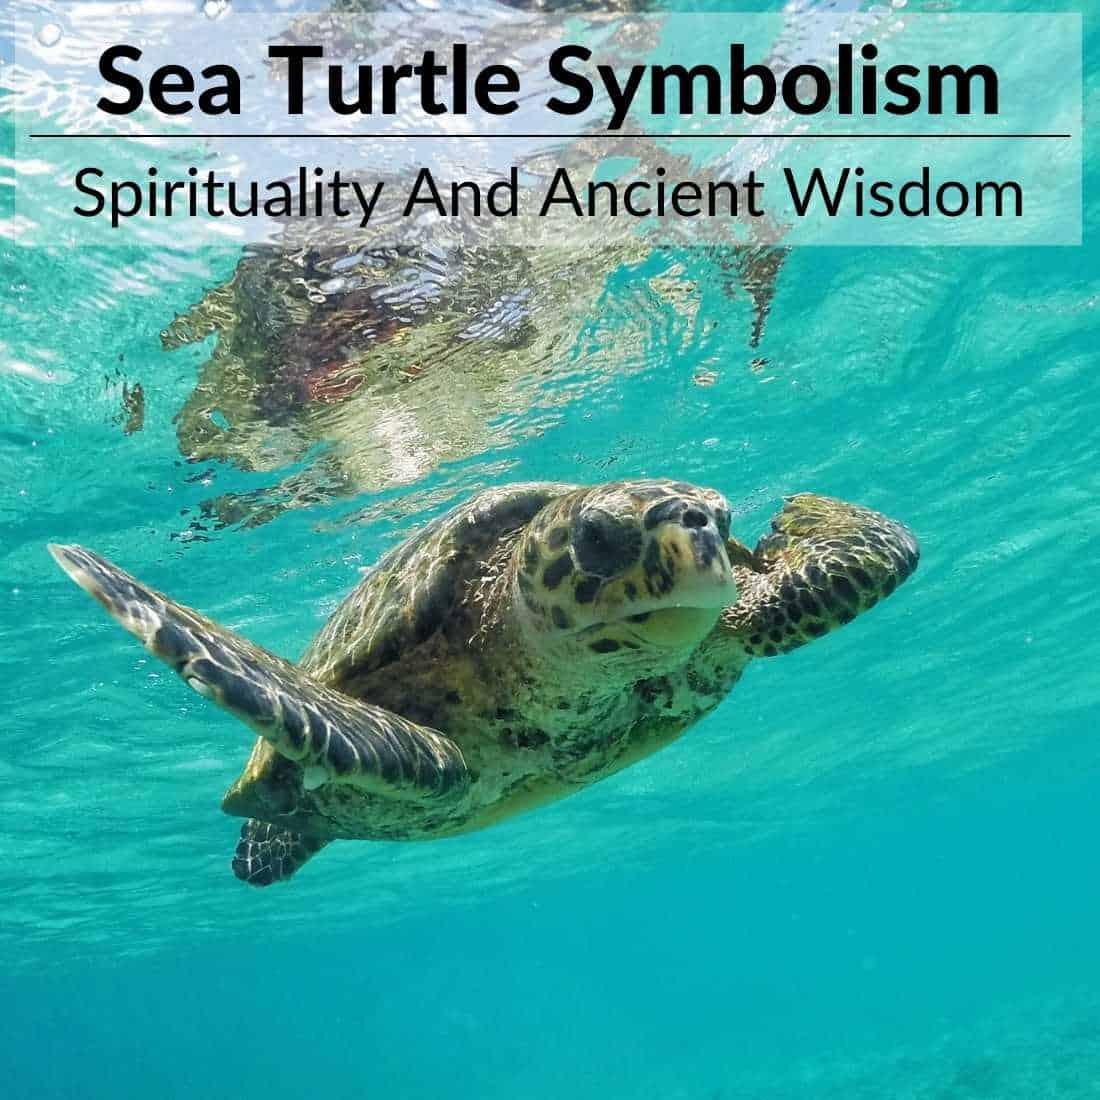 sea turtle symbolism